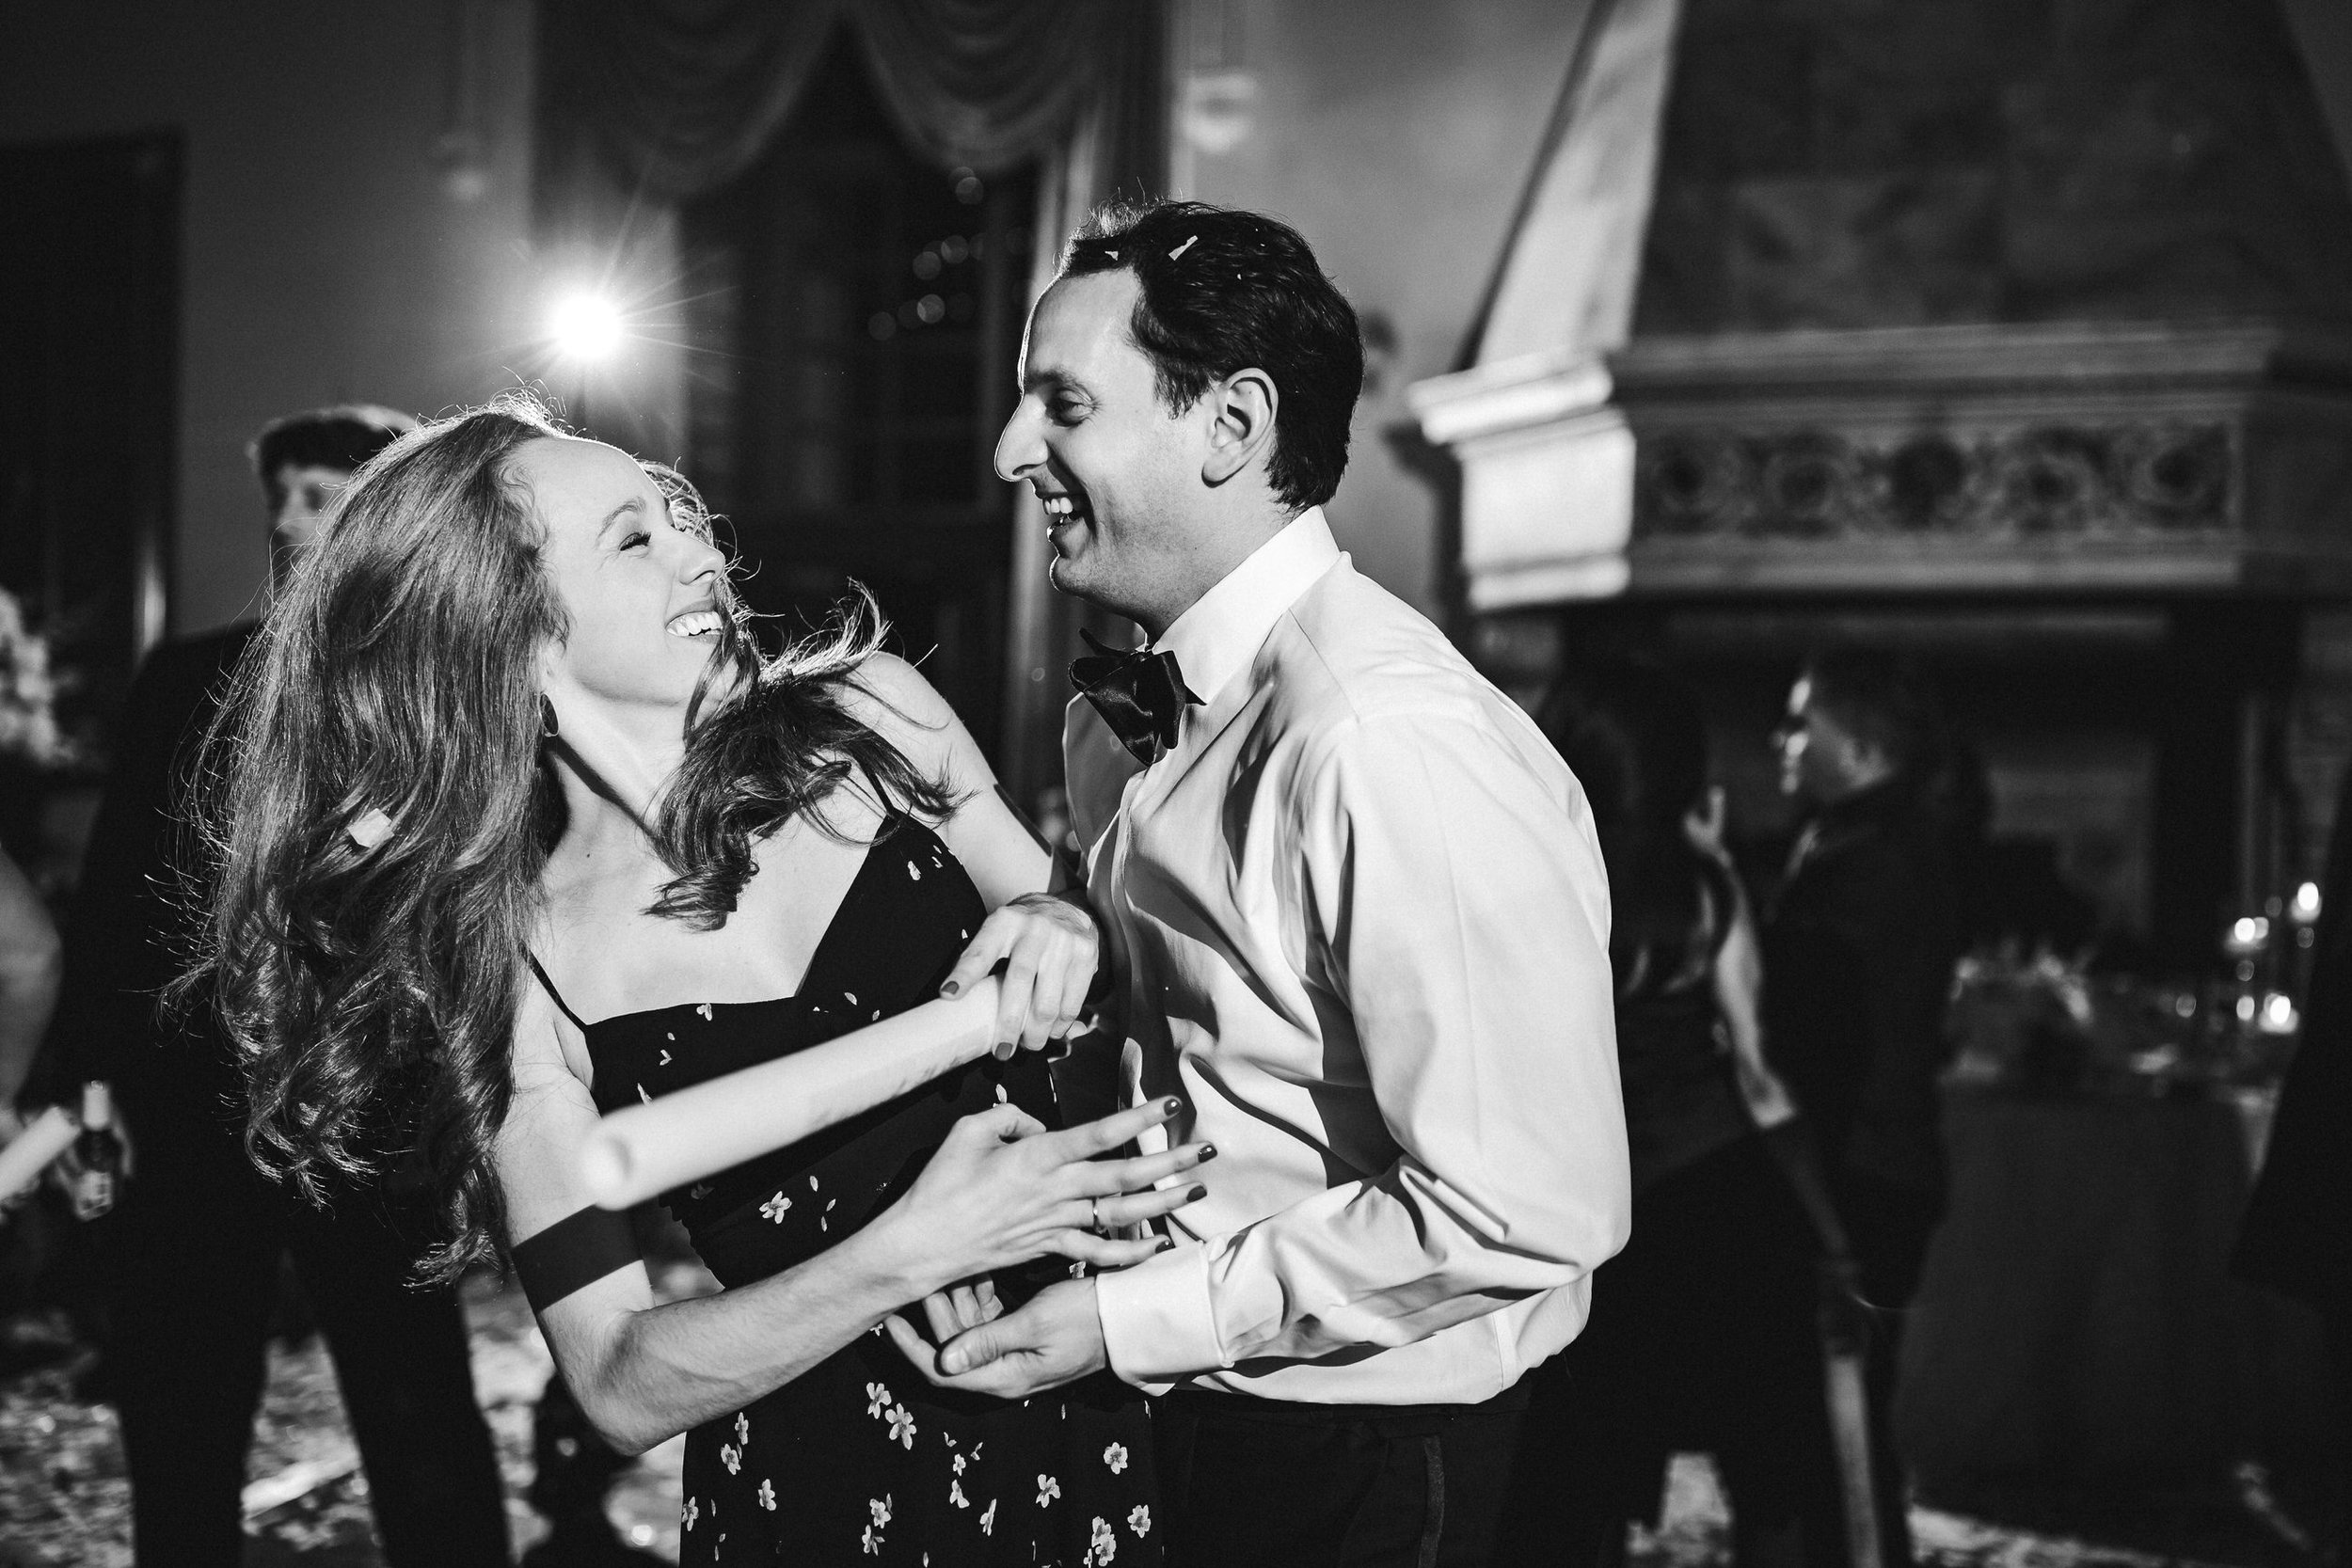 miami-biltmore-wedding-photographer-reception-party-43.jpg